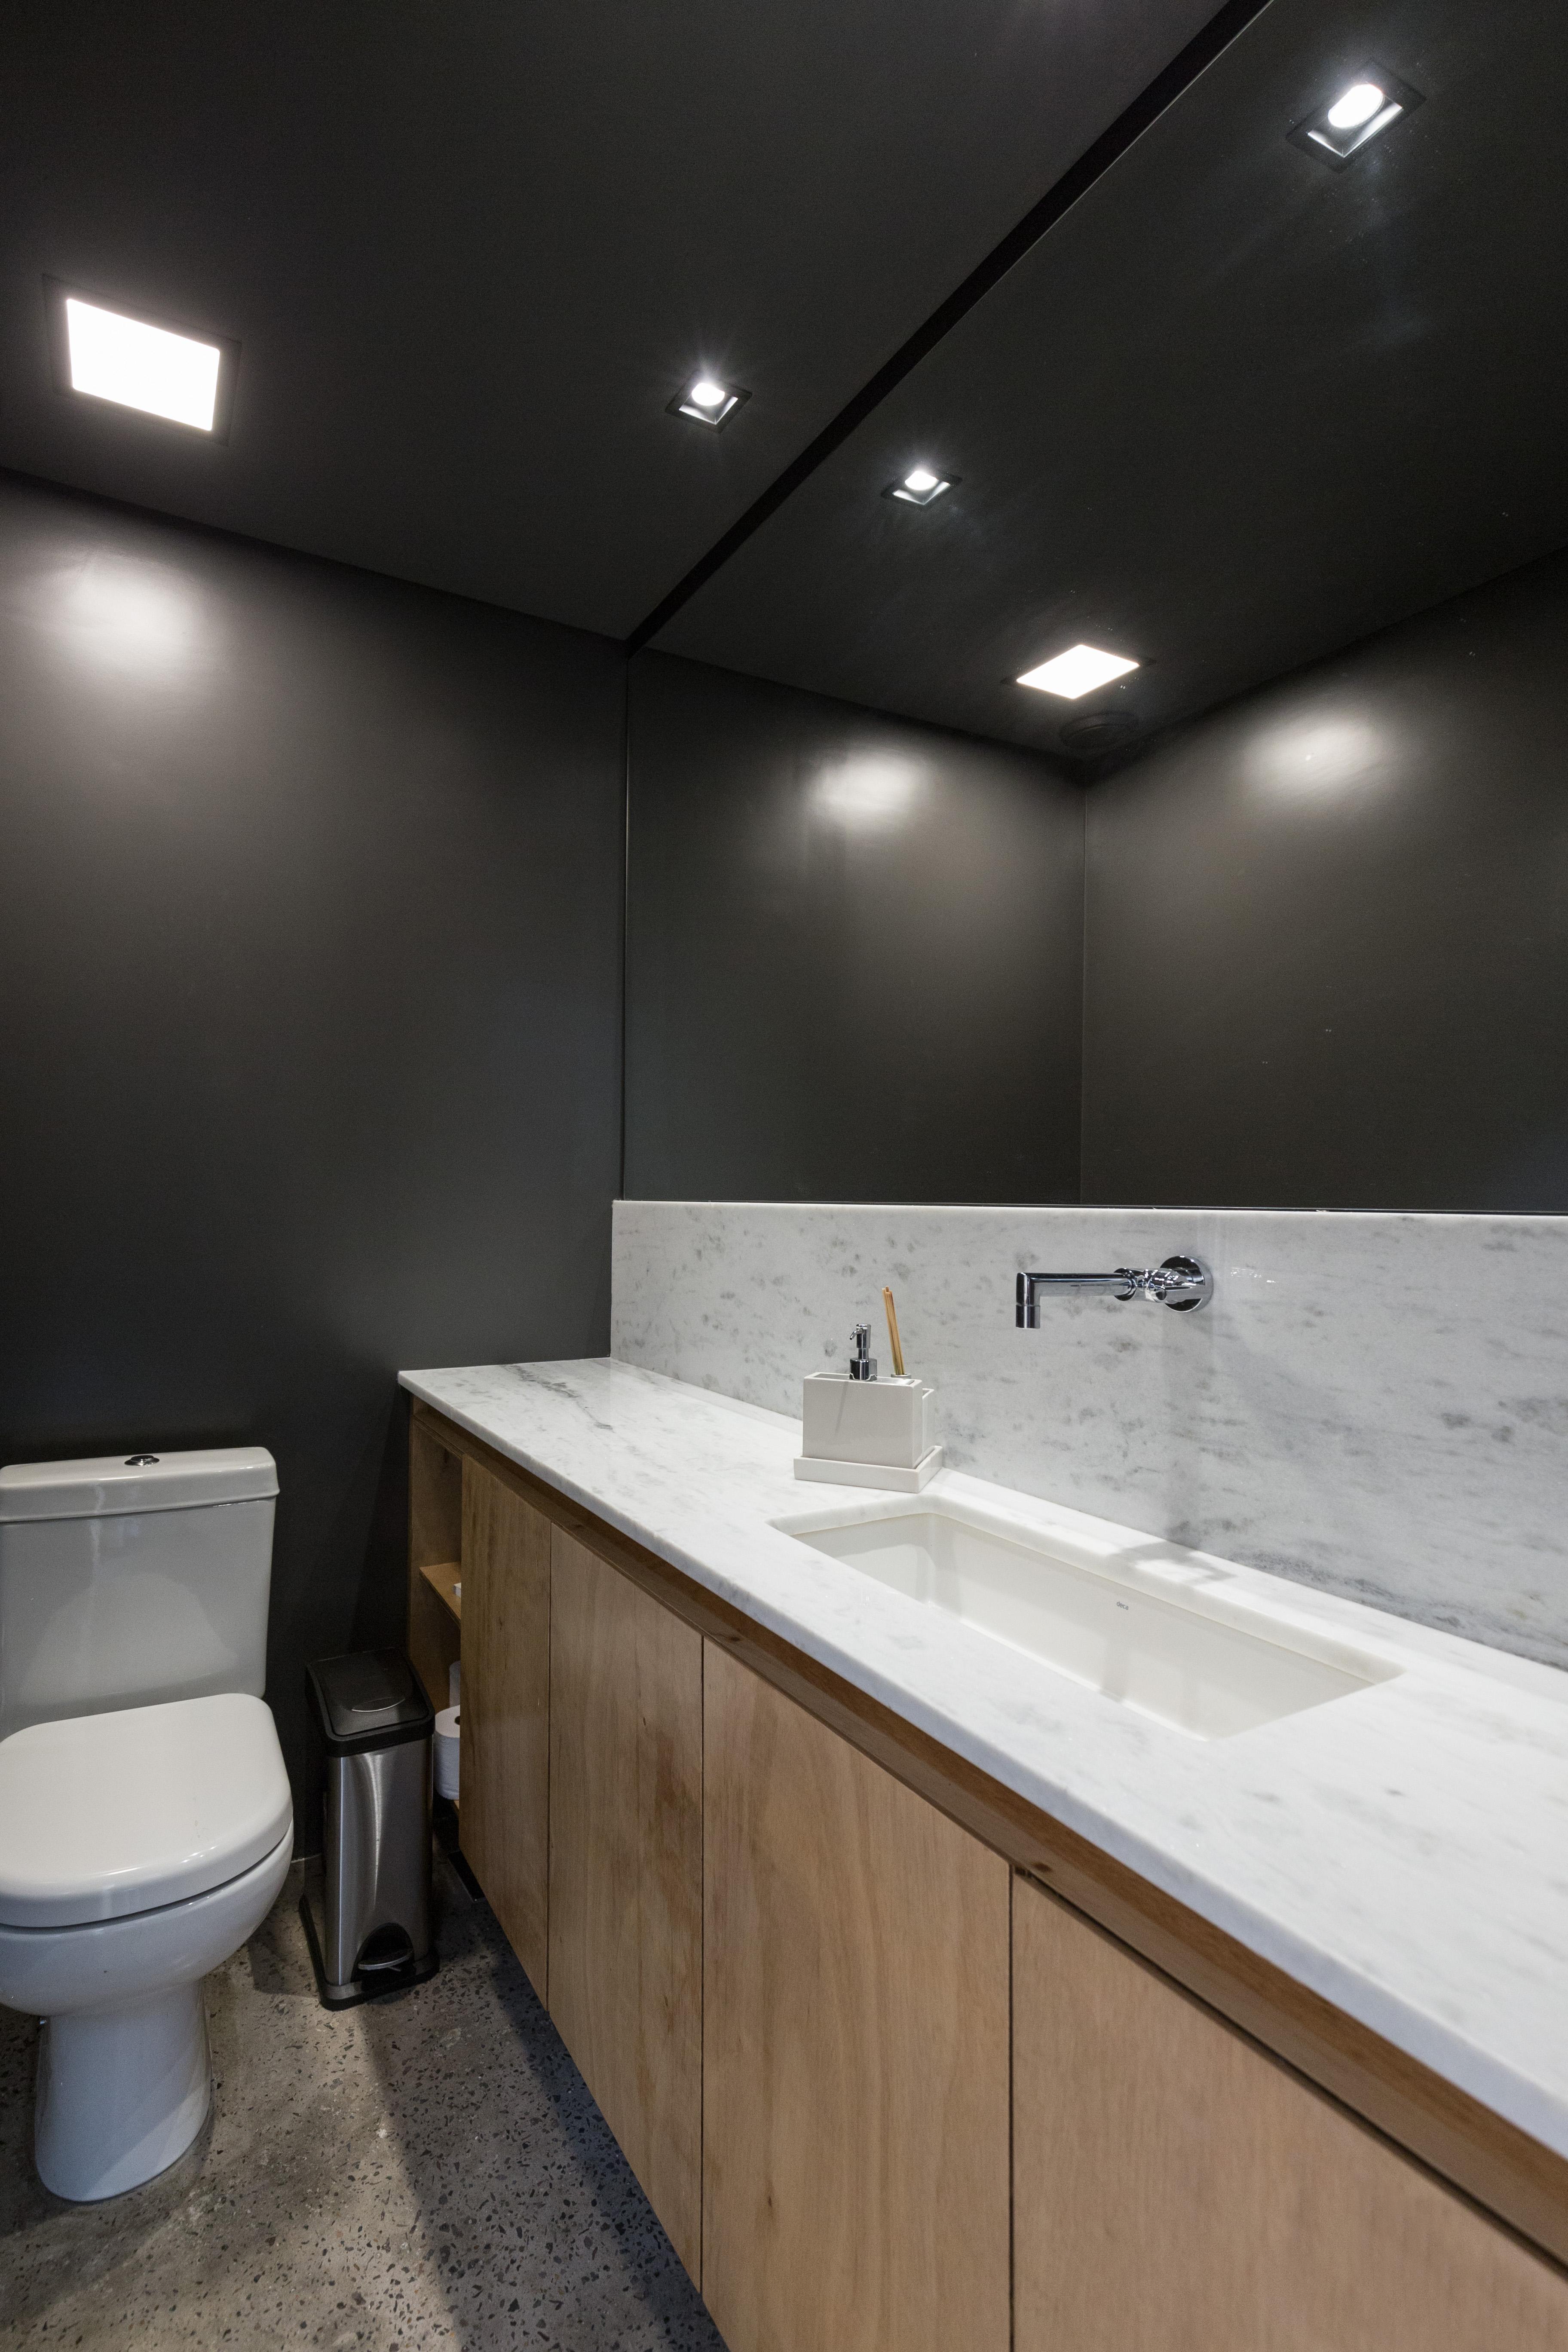 Republica 358 - Bathroom